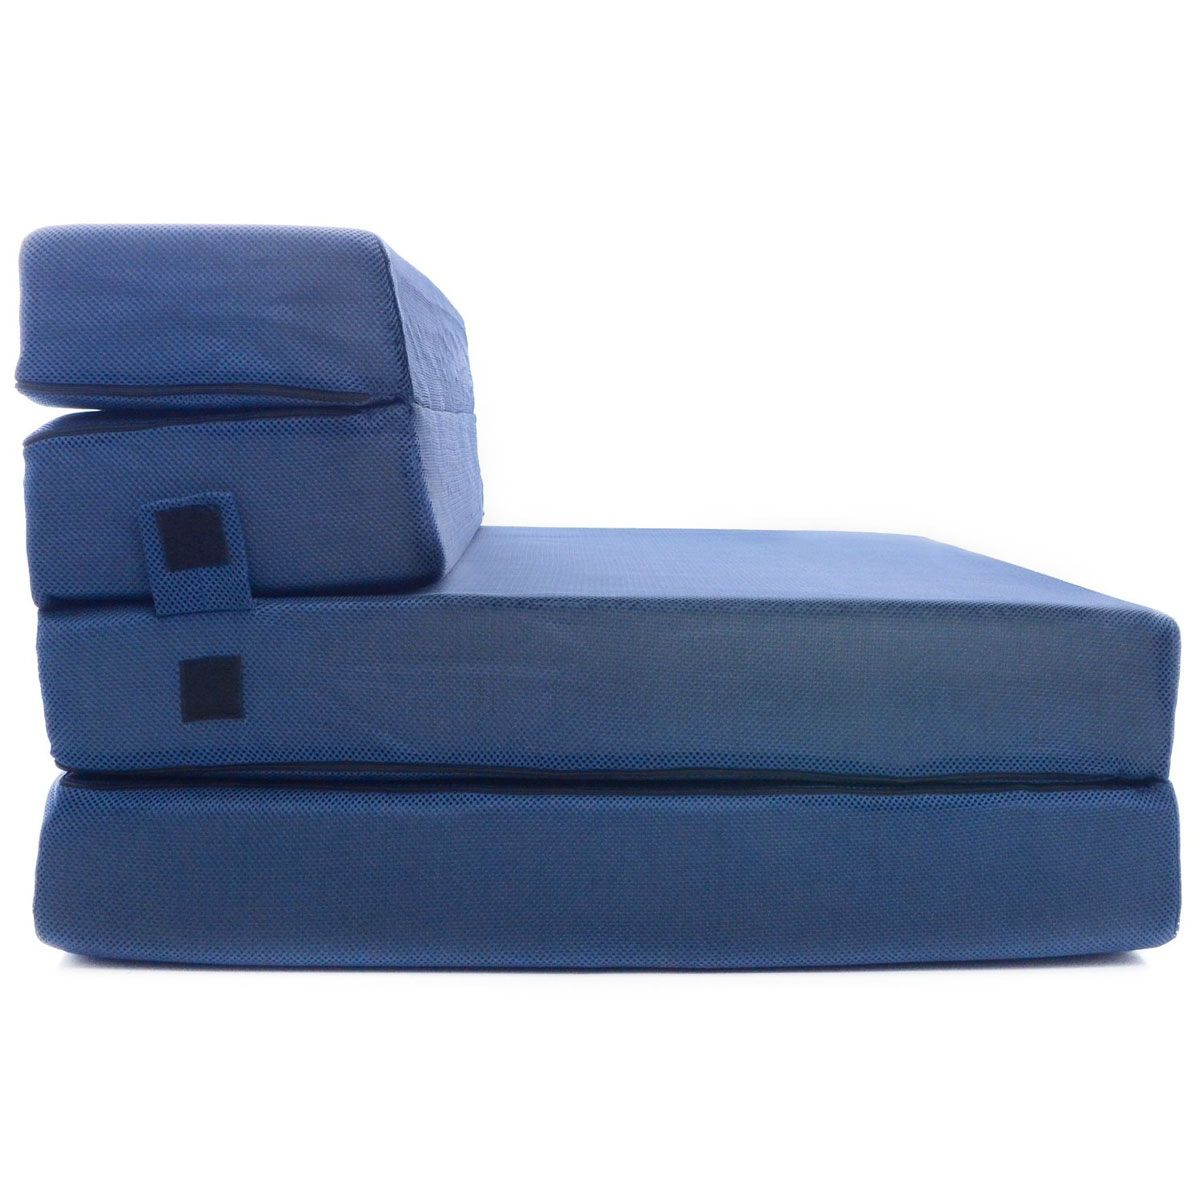 Couch Foam Mattress Sofa Foam Sofa Sofa Bed